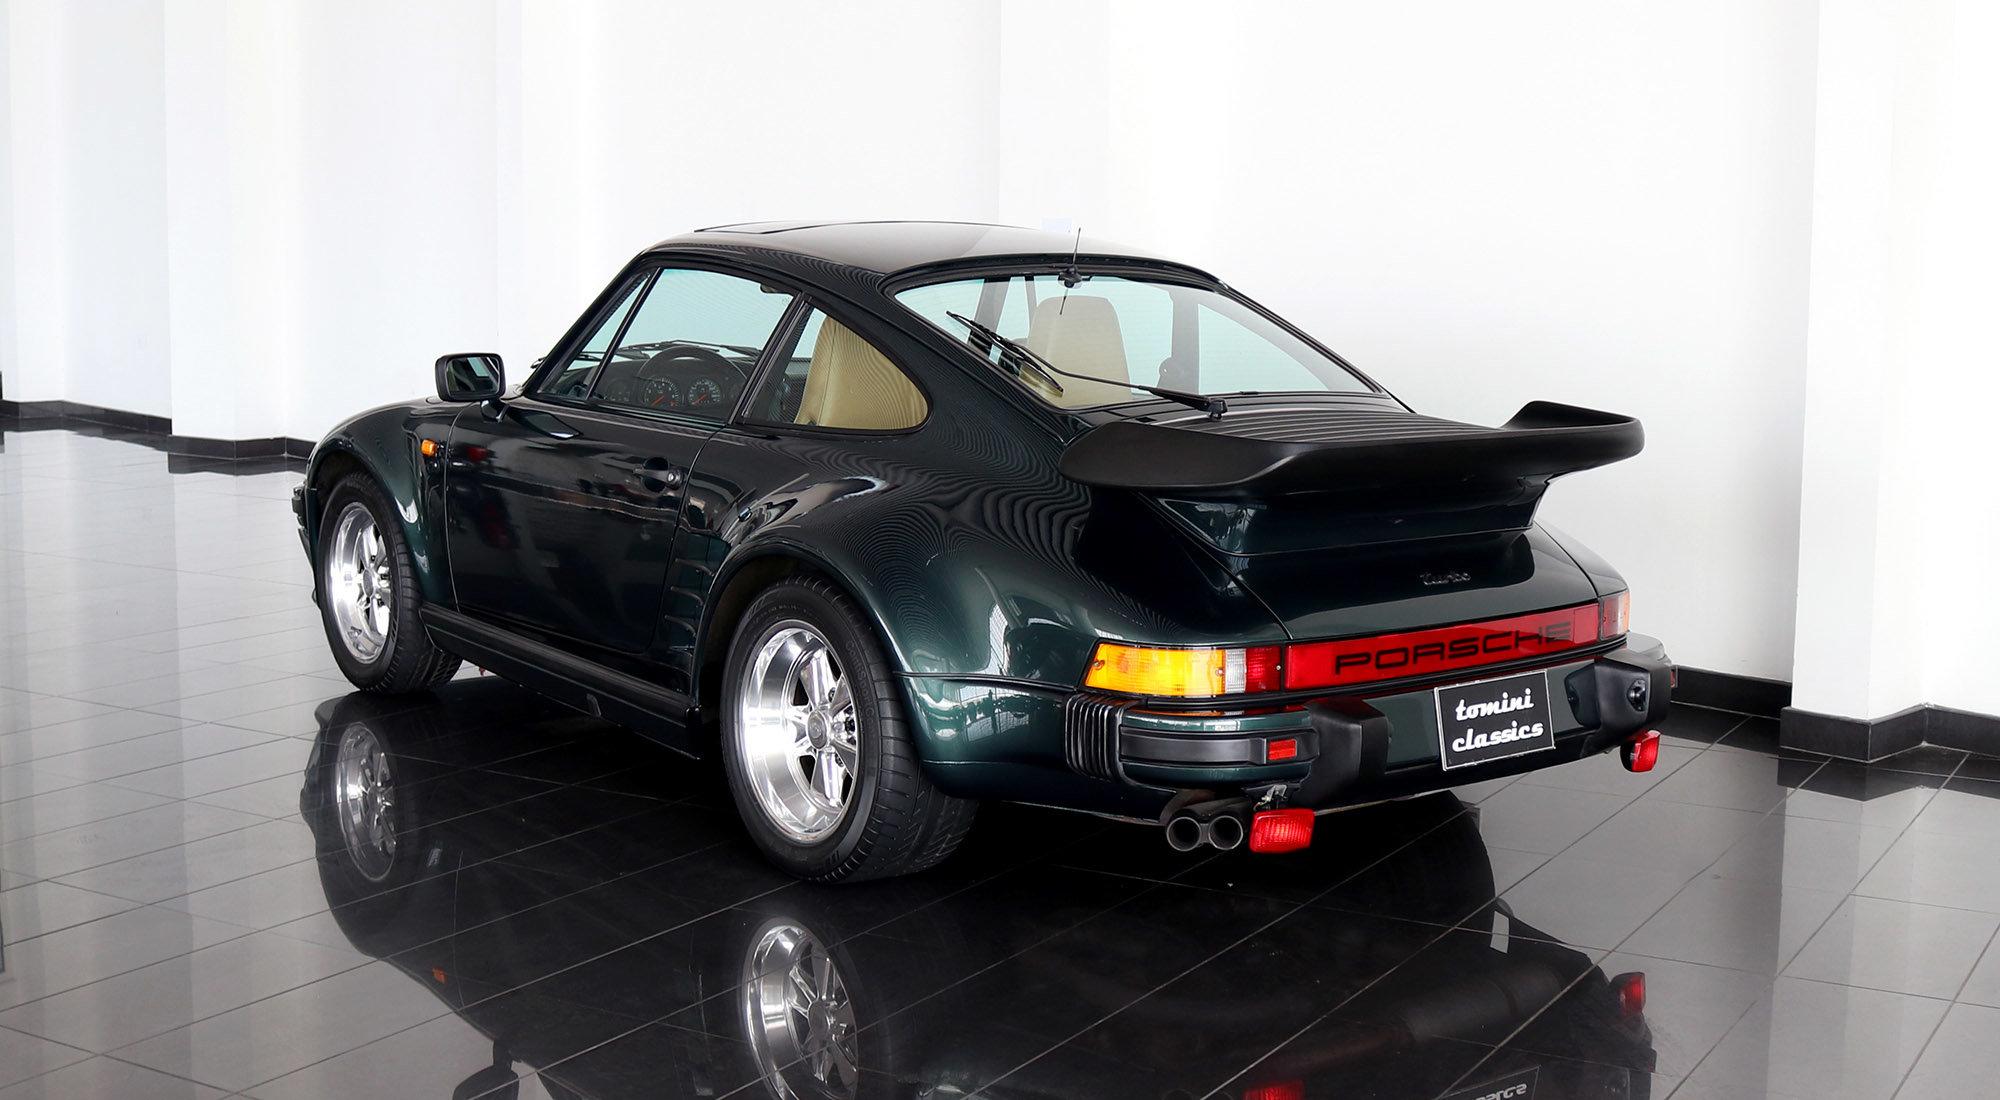 Porsche 930 SE 'Slantnose' (1986) For Sale (picture 3 of 6)